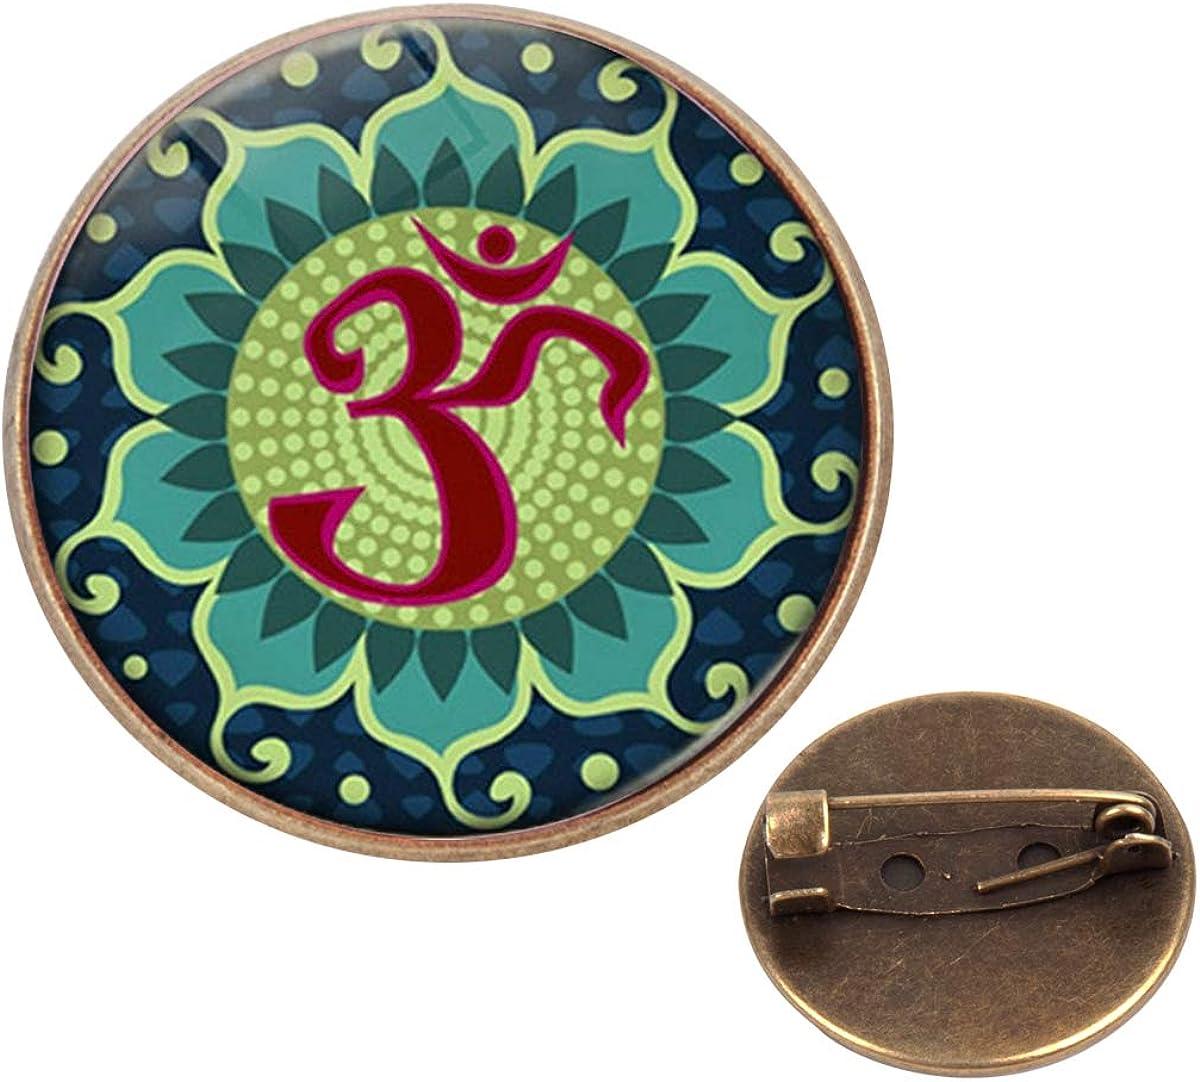 Pinback Buttons Badges Pins Purple Mandala Meaningful Spiritual Lapel Pin Brooch Clip Trendy Accessory Jacket T-Shirt Bag Hat Shoe